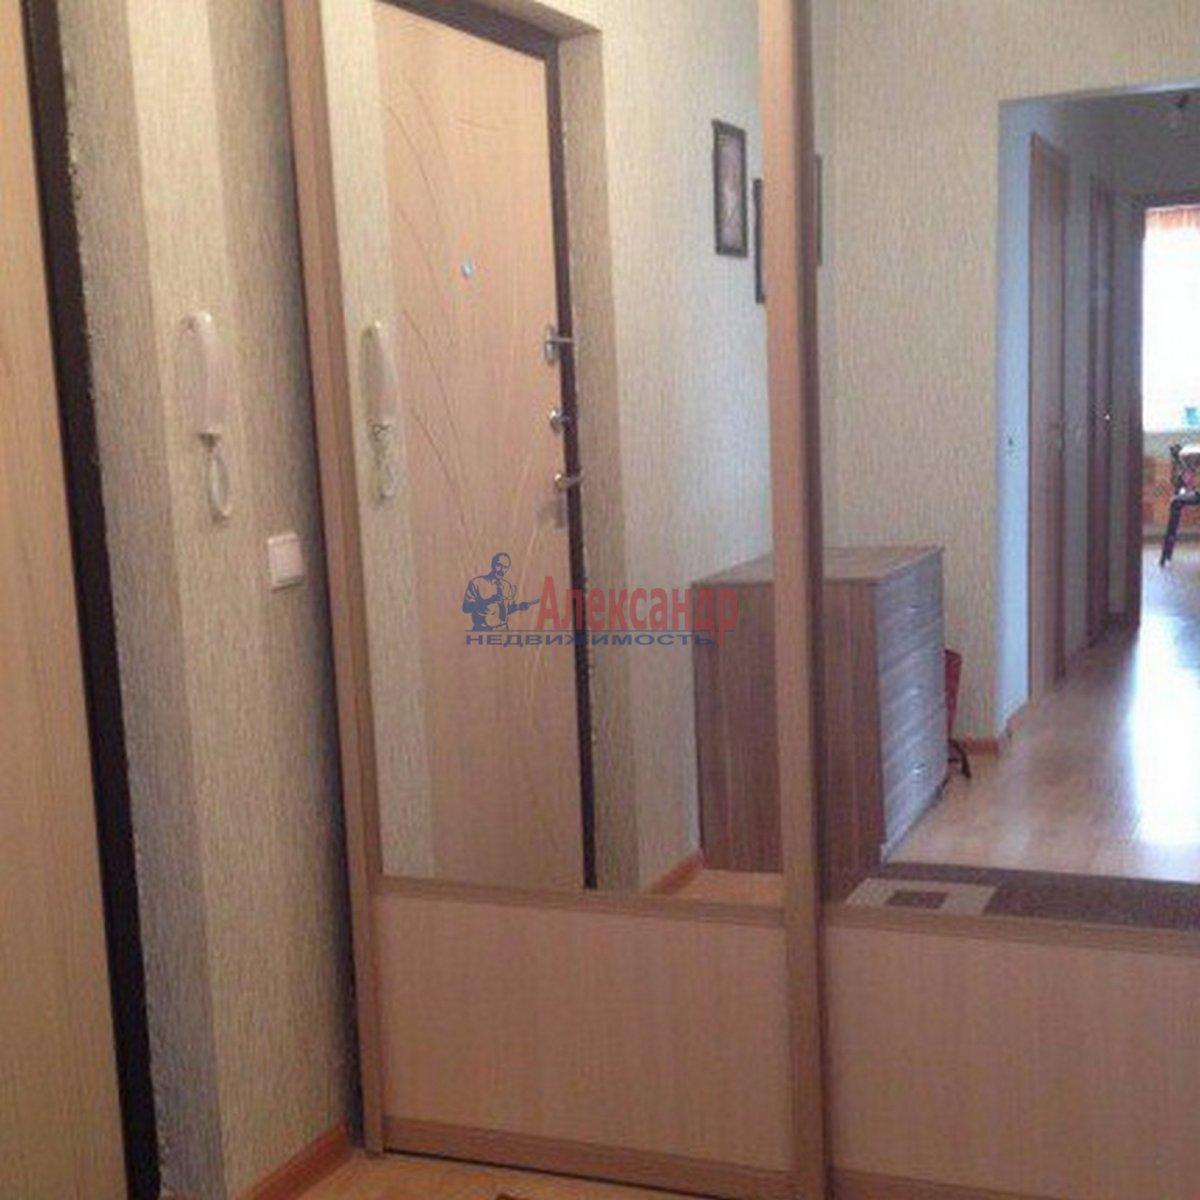 2-комнатная квартира (54м2) в аренду по адресу Елизарова пр., 18— фото 3 из 8